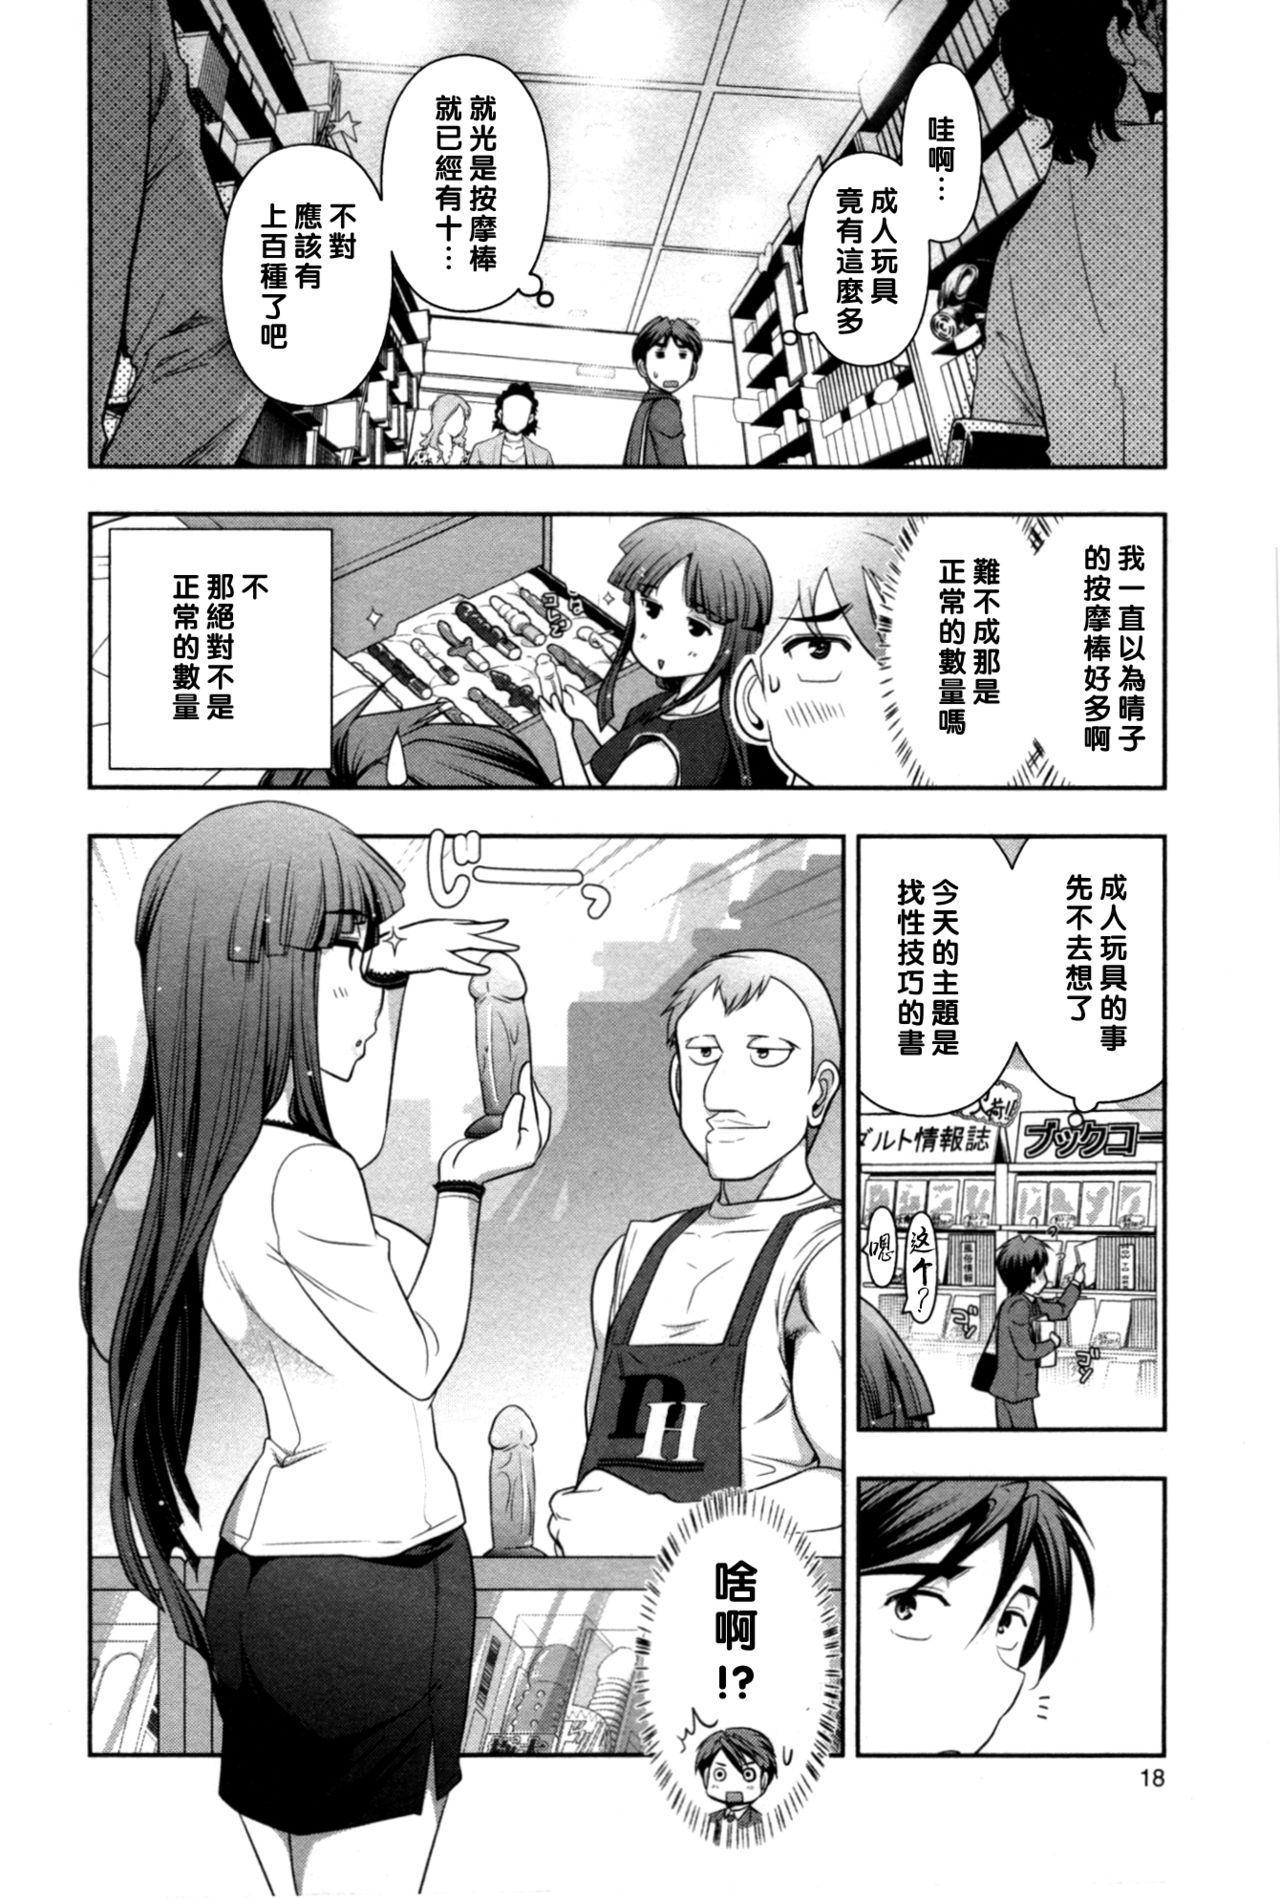 Haruko-san no Niizuma Recipe Ch. 2 3